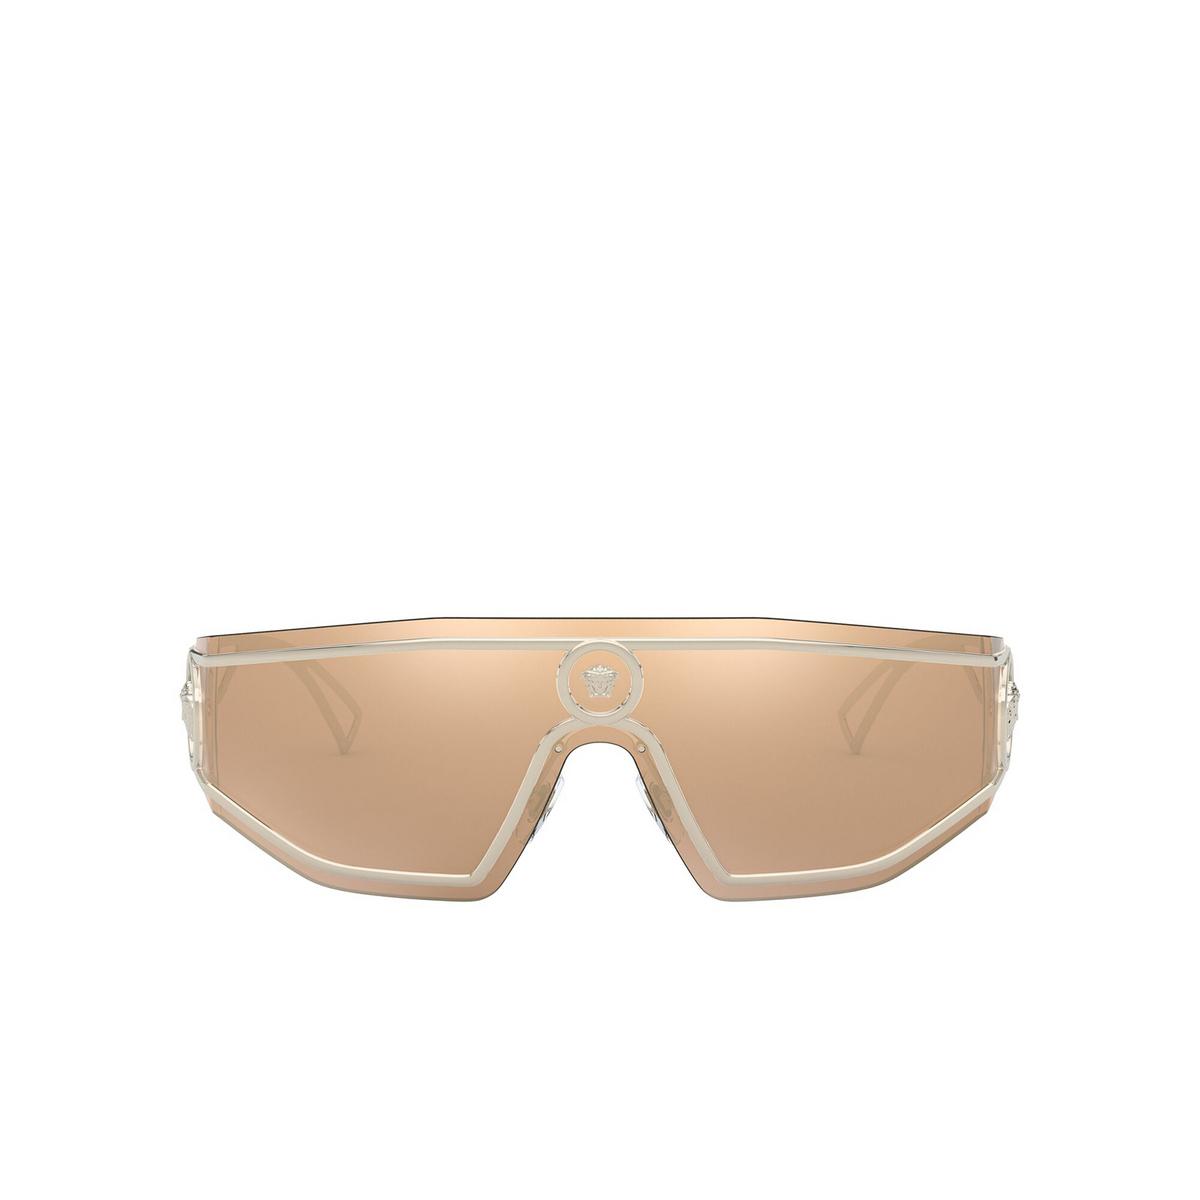 Versace® Mask Sunglasses: VE2226 color Pale Gold 12527P - front view.